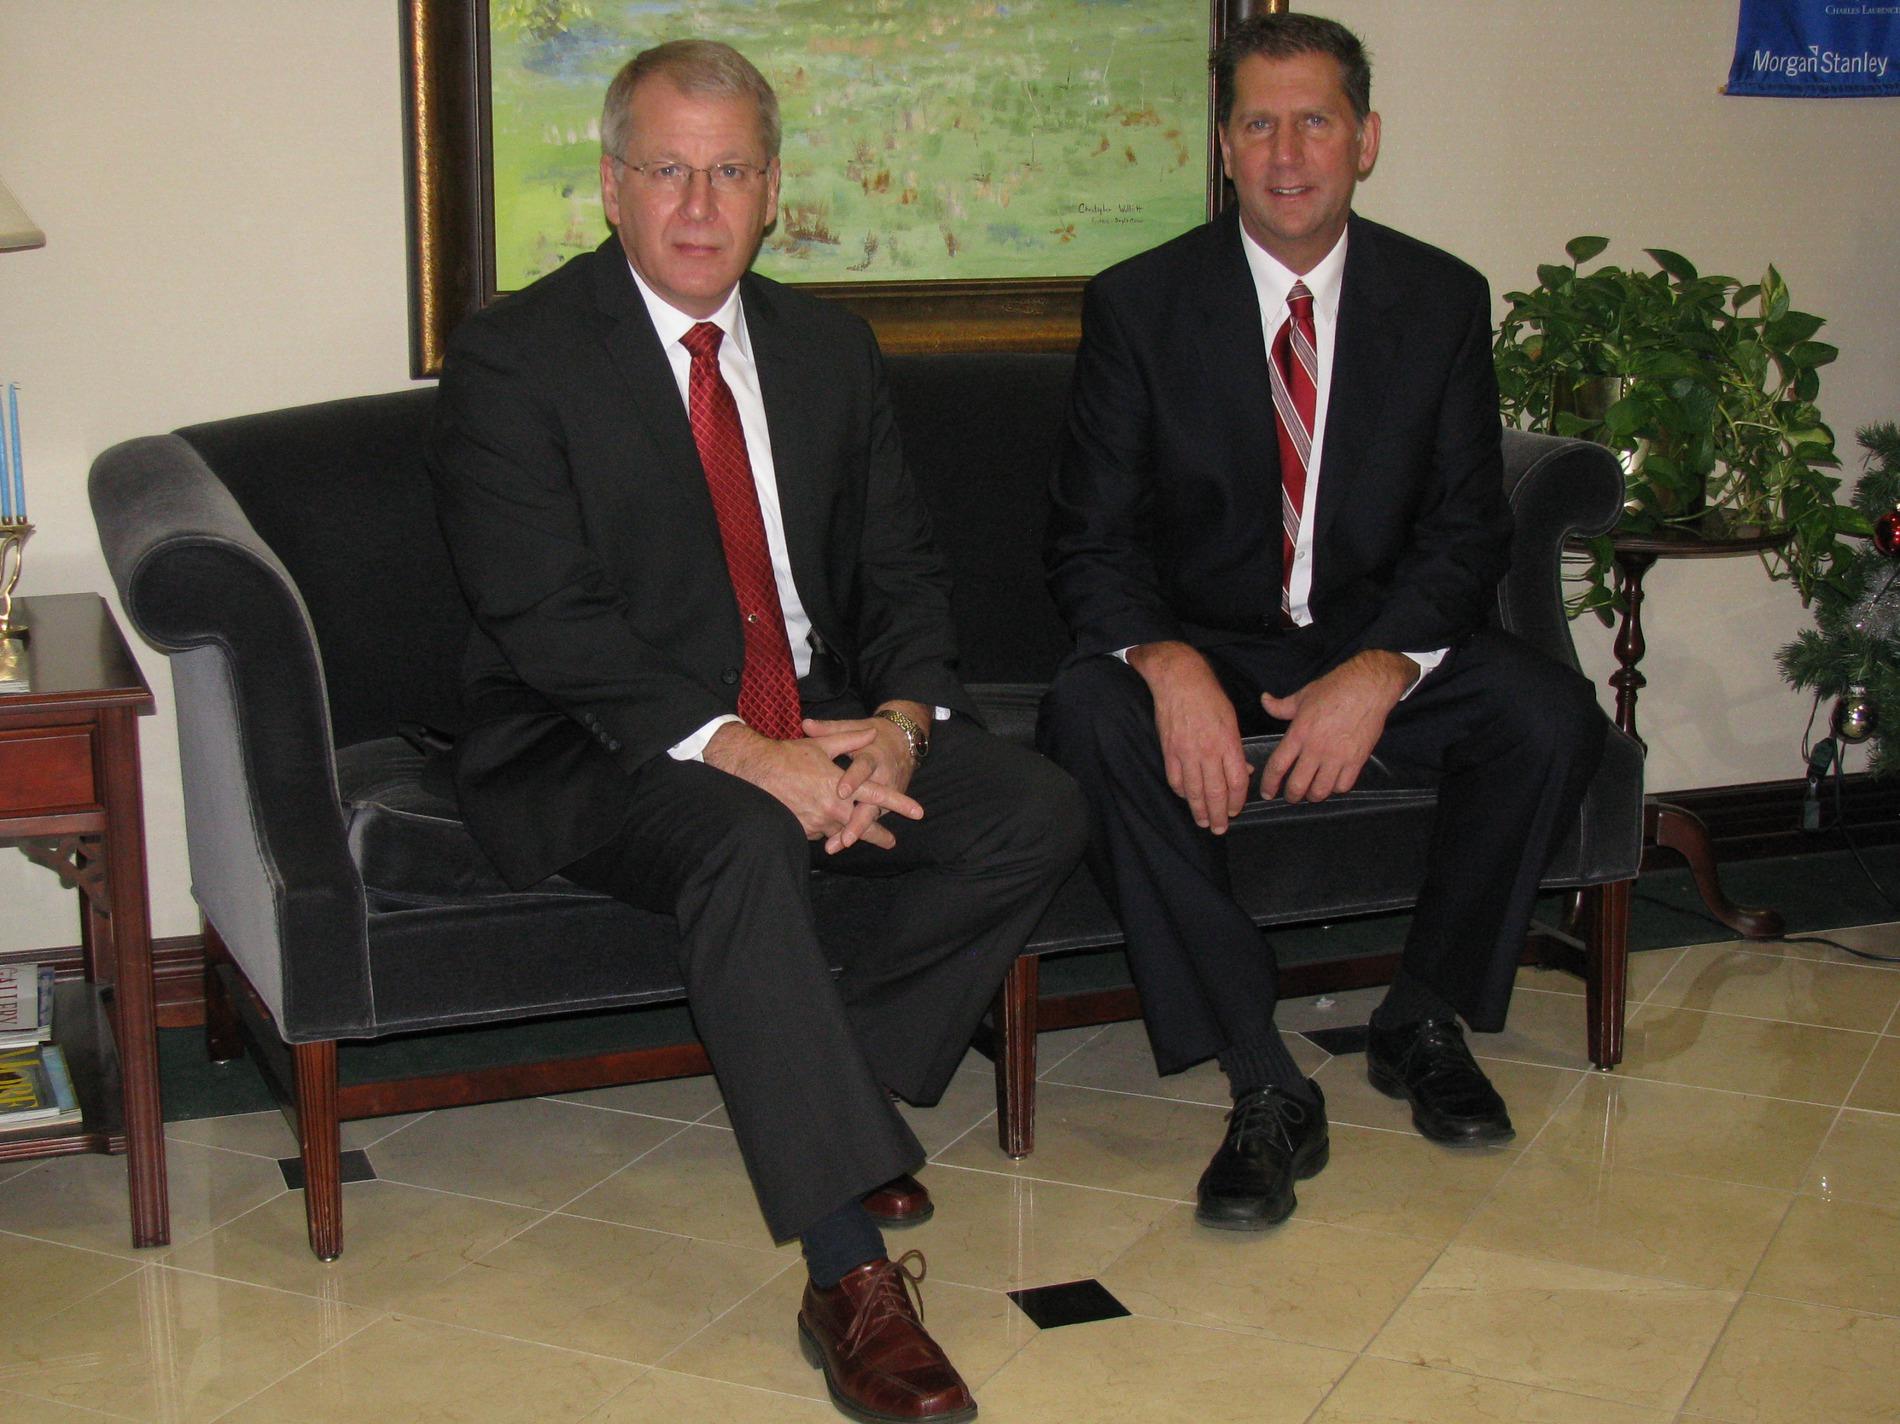 The Burns Haurin Group   Doylestown, PA   Morgan Stanley